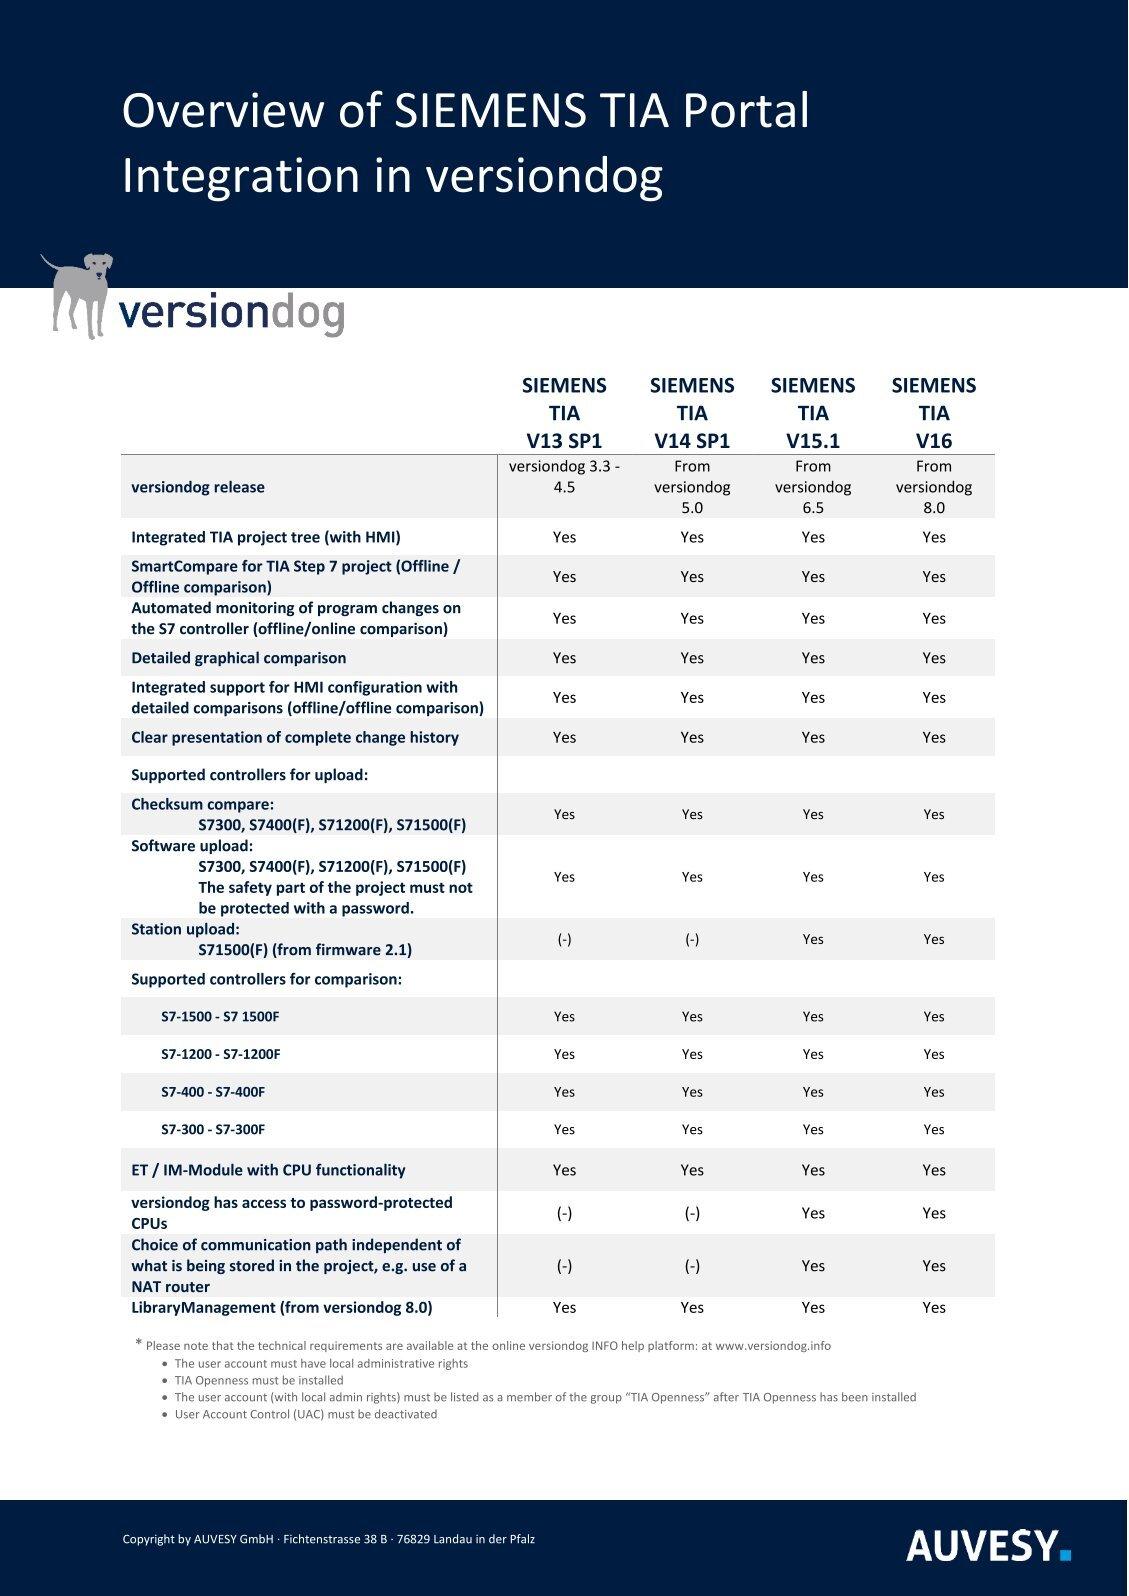 SIEMENS TIA Portal Roadmap - AUVESY